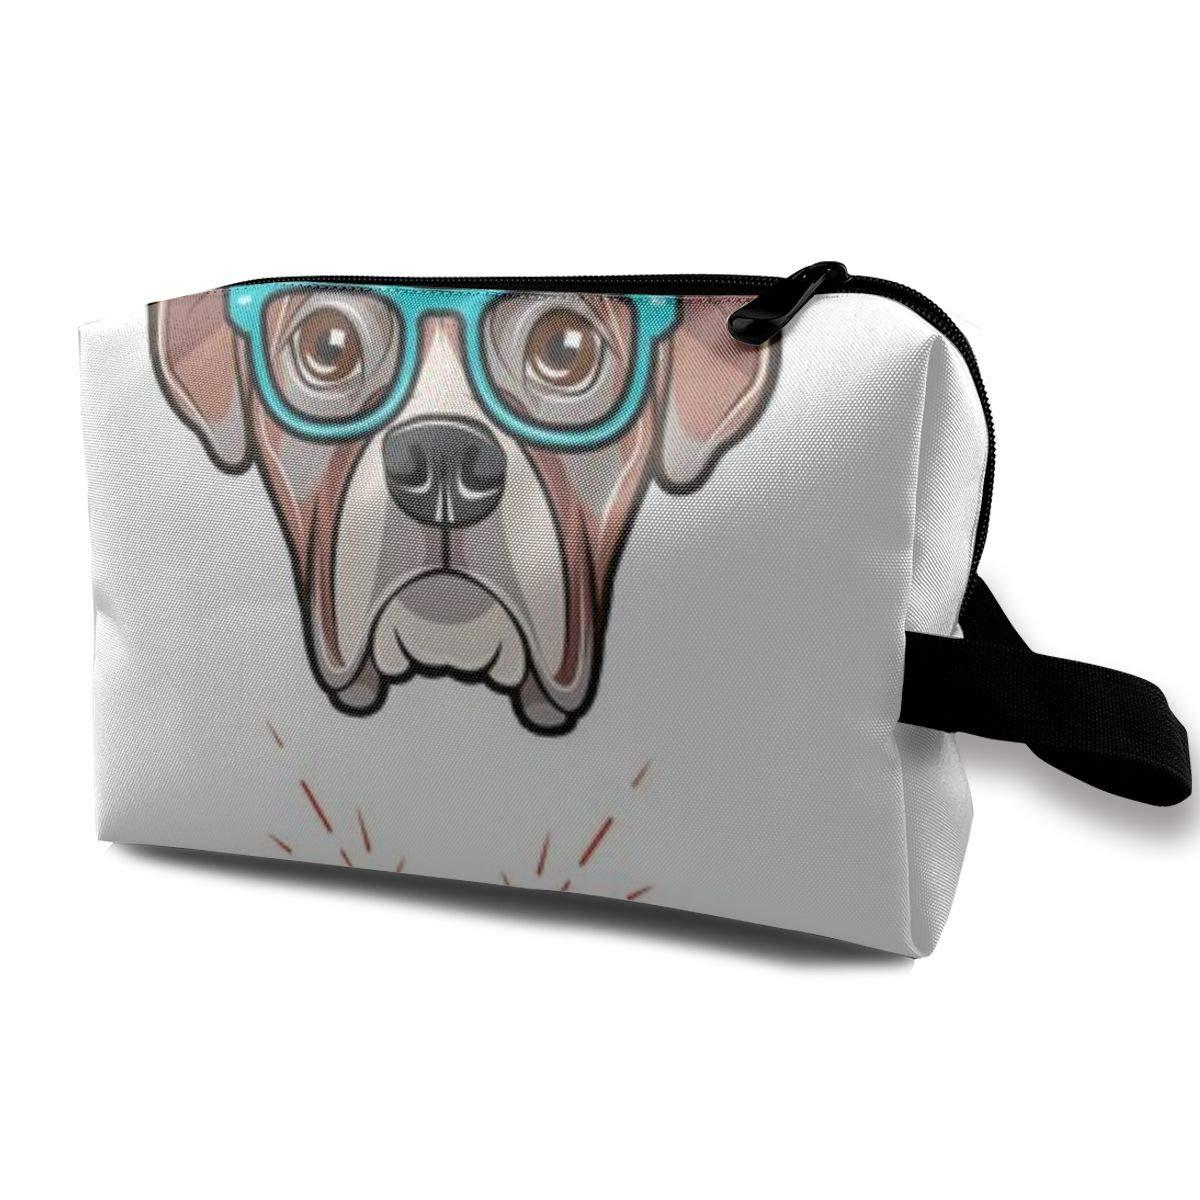 Makeup Bag Cosmetic Pouch Boxer Dog Wearing Glasses Multi-Functional Bag Travel Kit Storage Bag